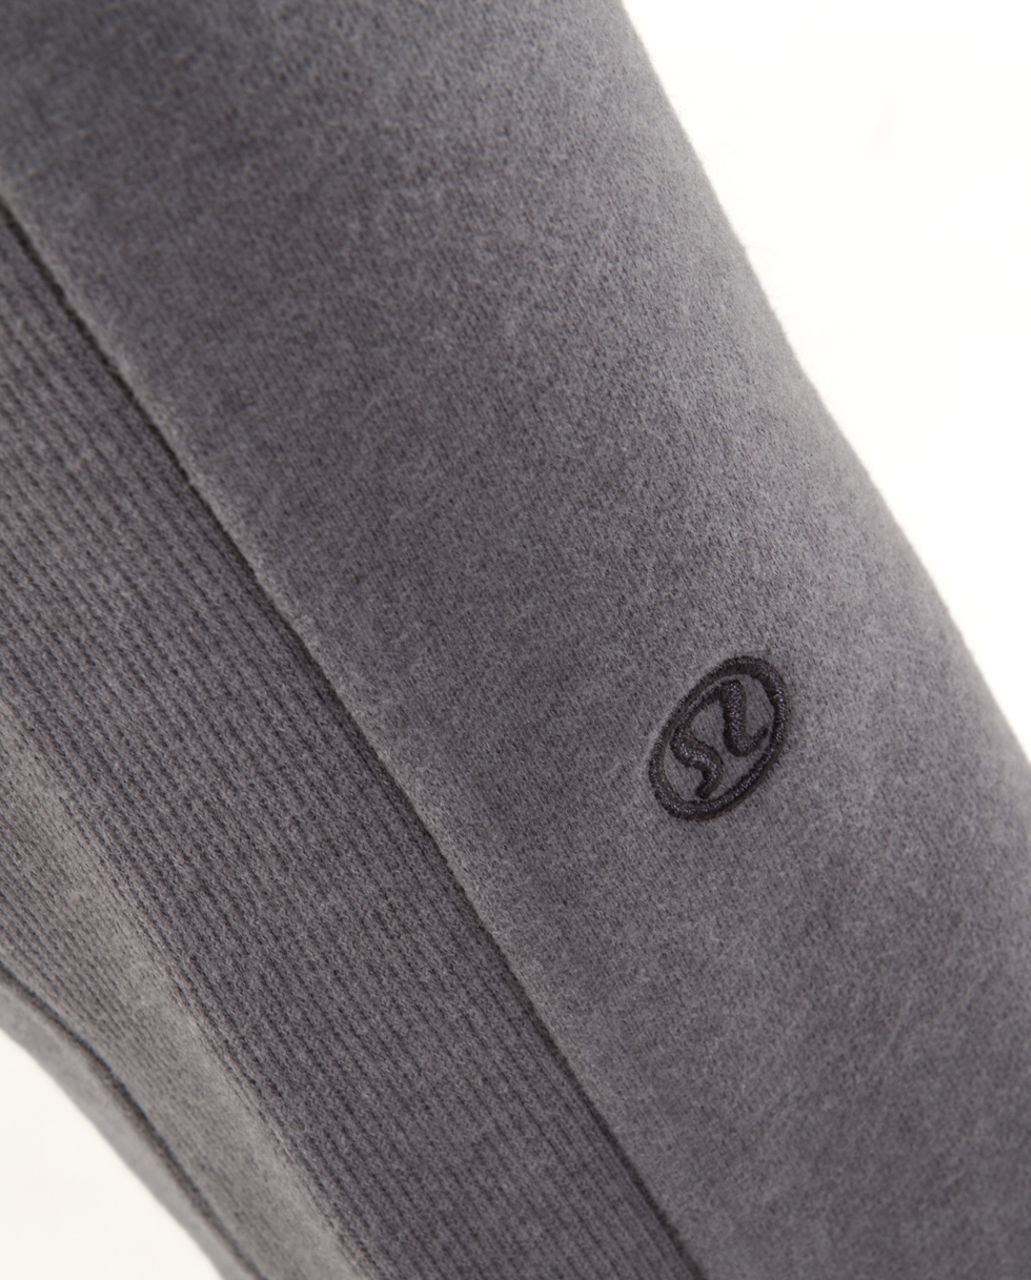 Lululemon Cuddle Up Pant II - Heathered Blurred Grey /  Blurred Grey